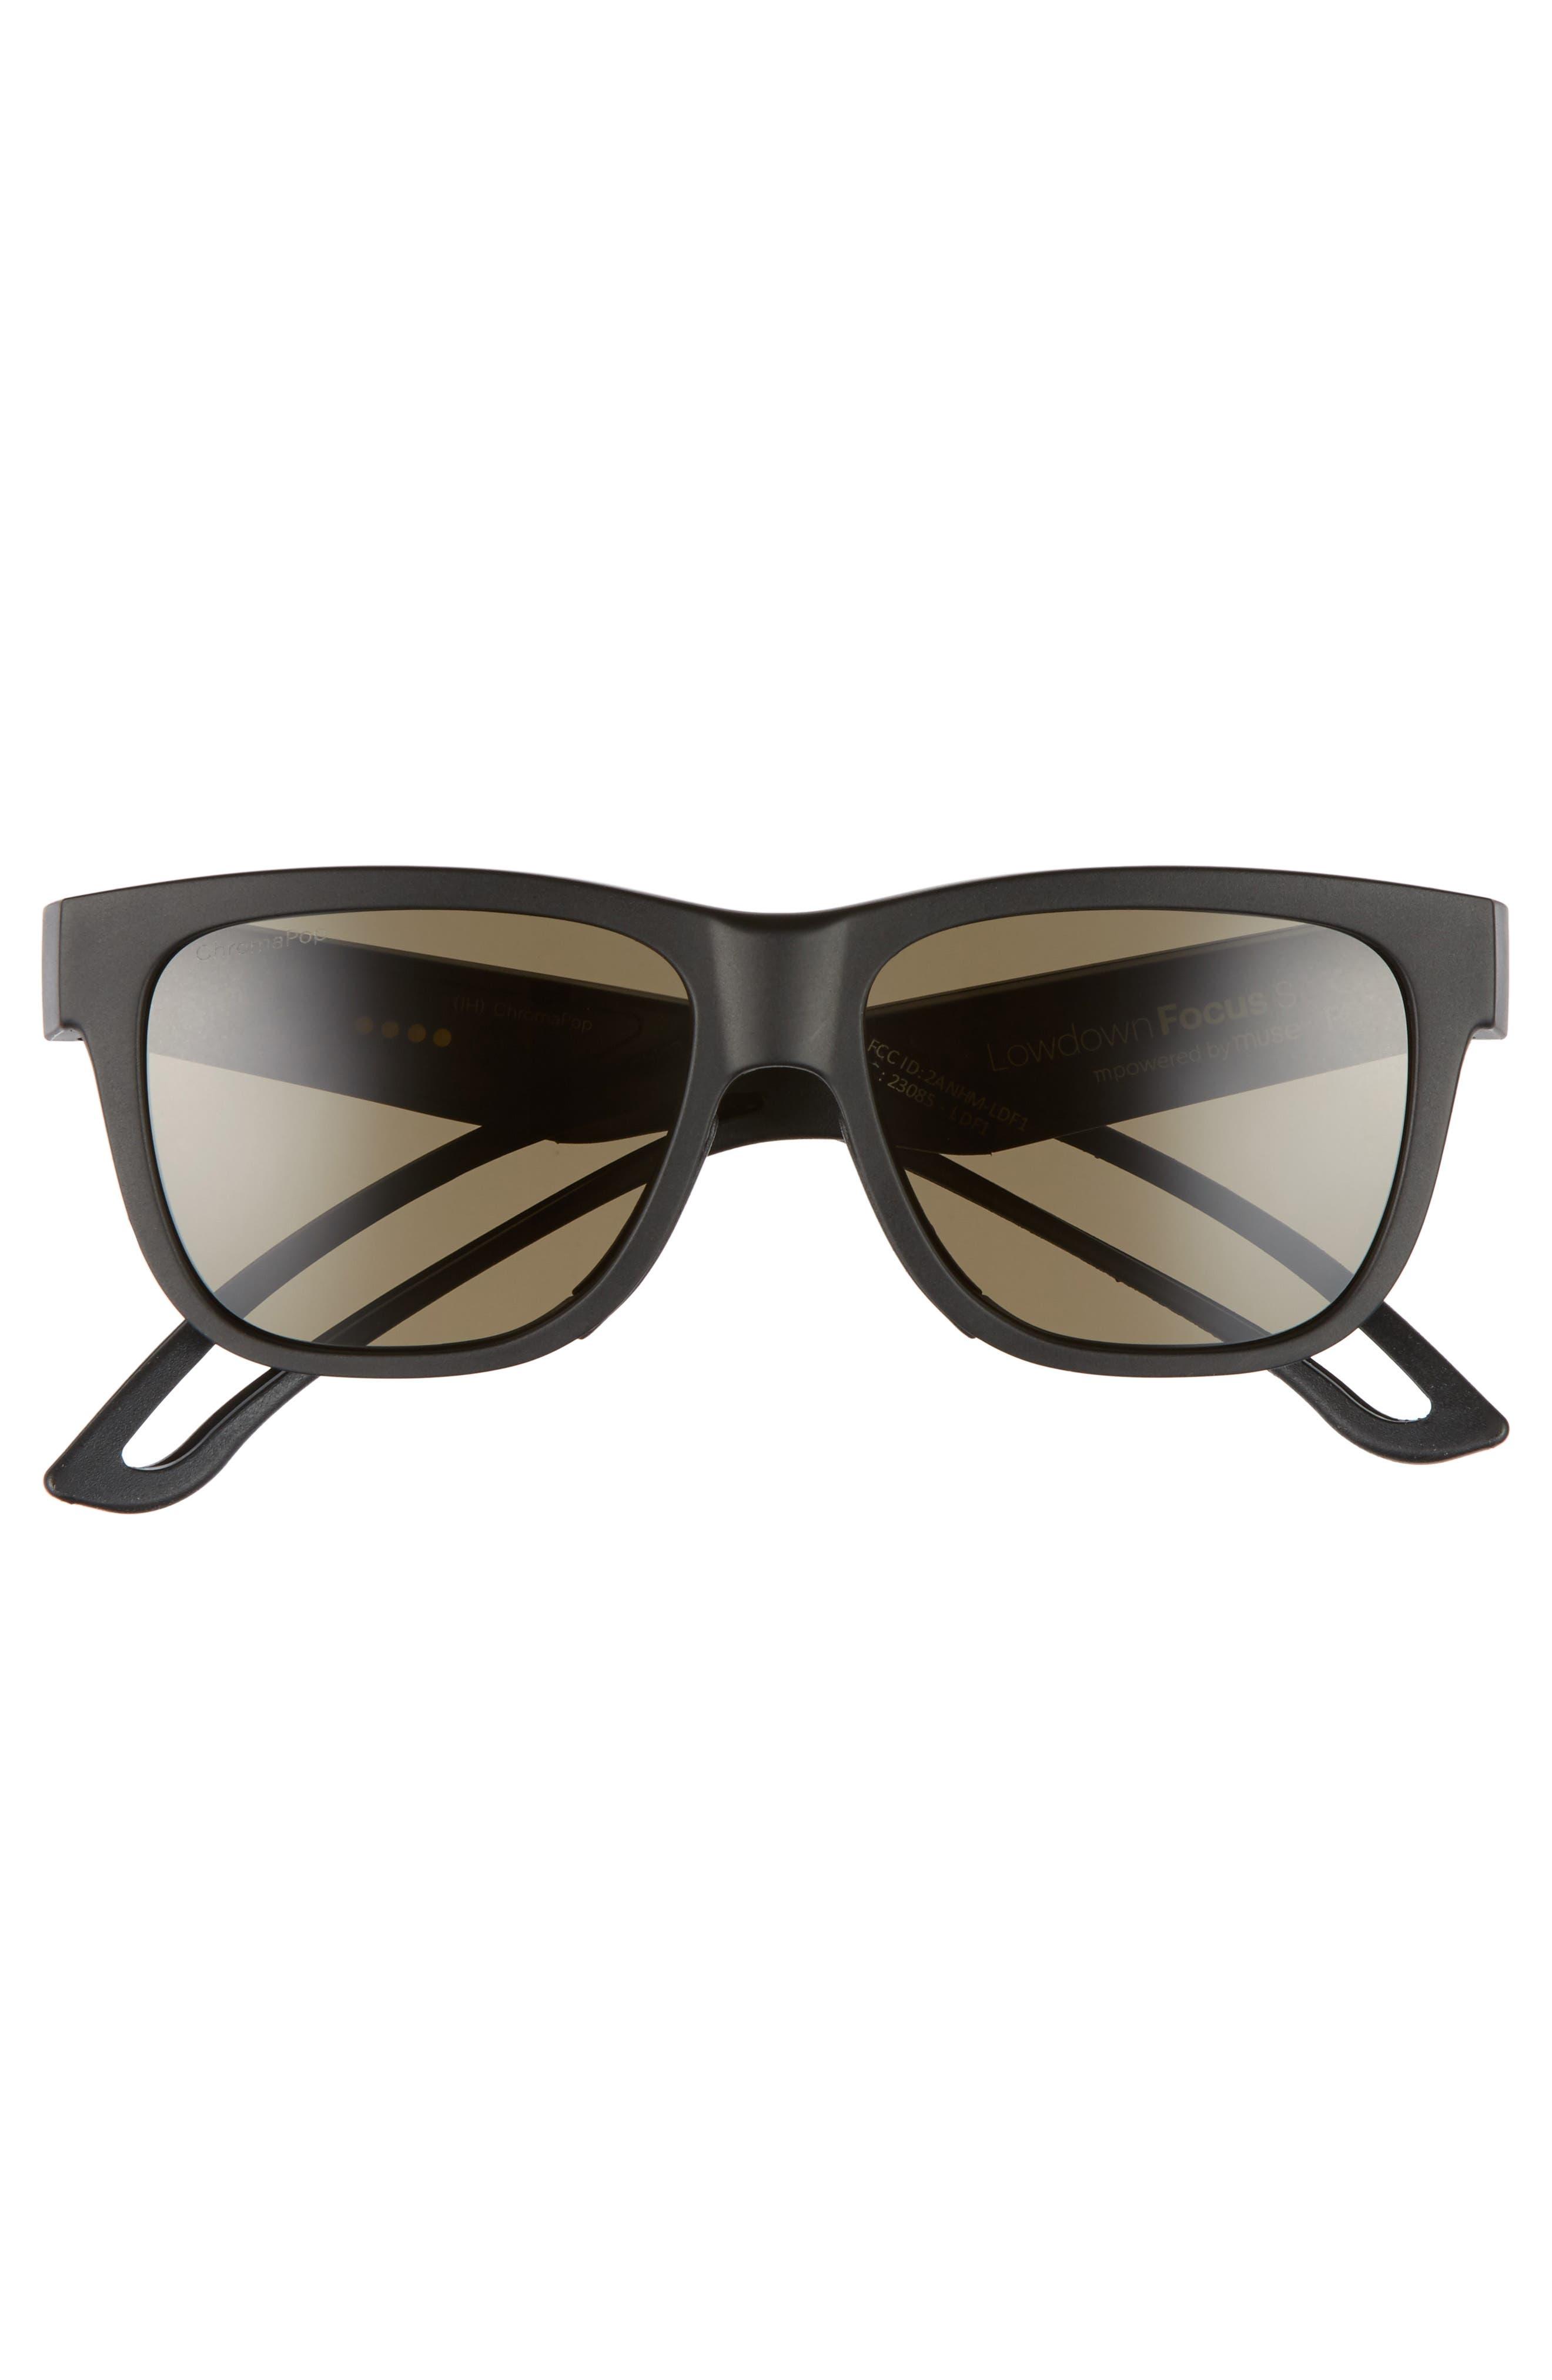 67c6decf70 Wayfarer Smith Sunglasses